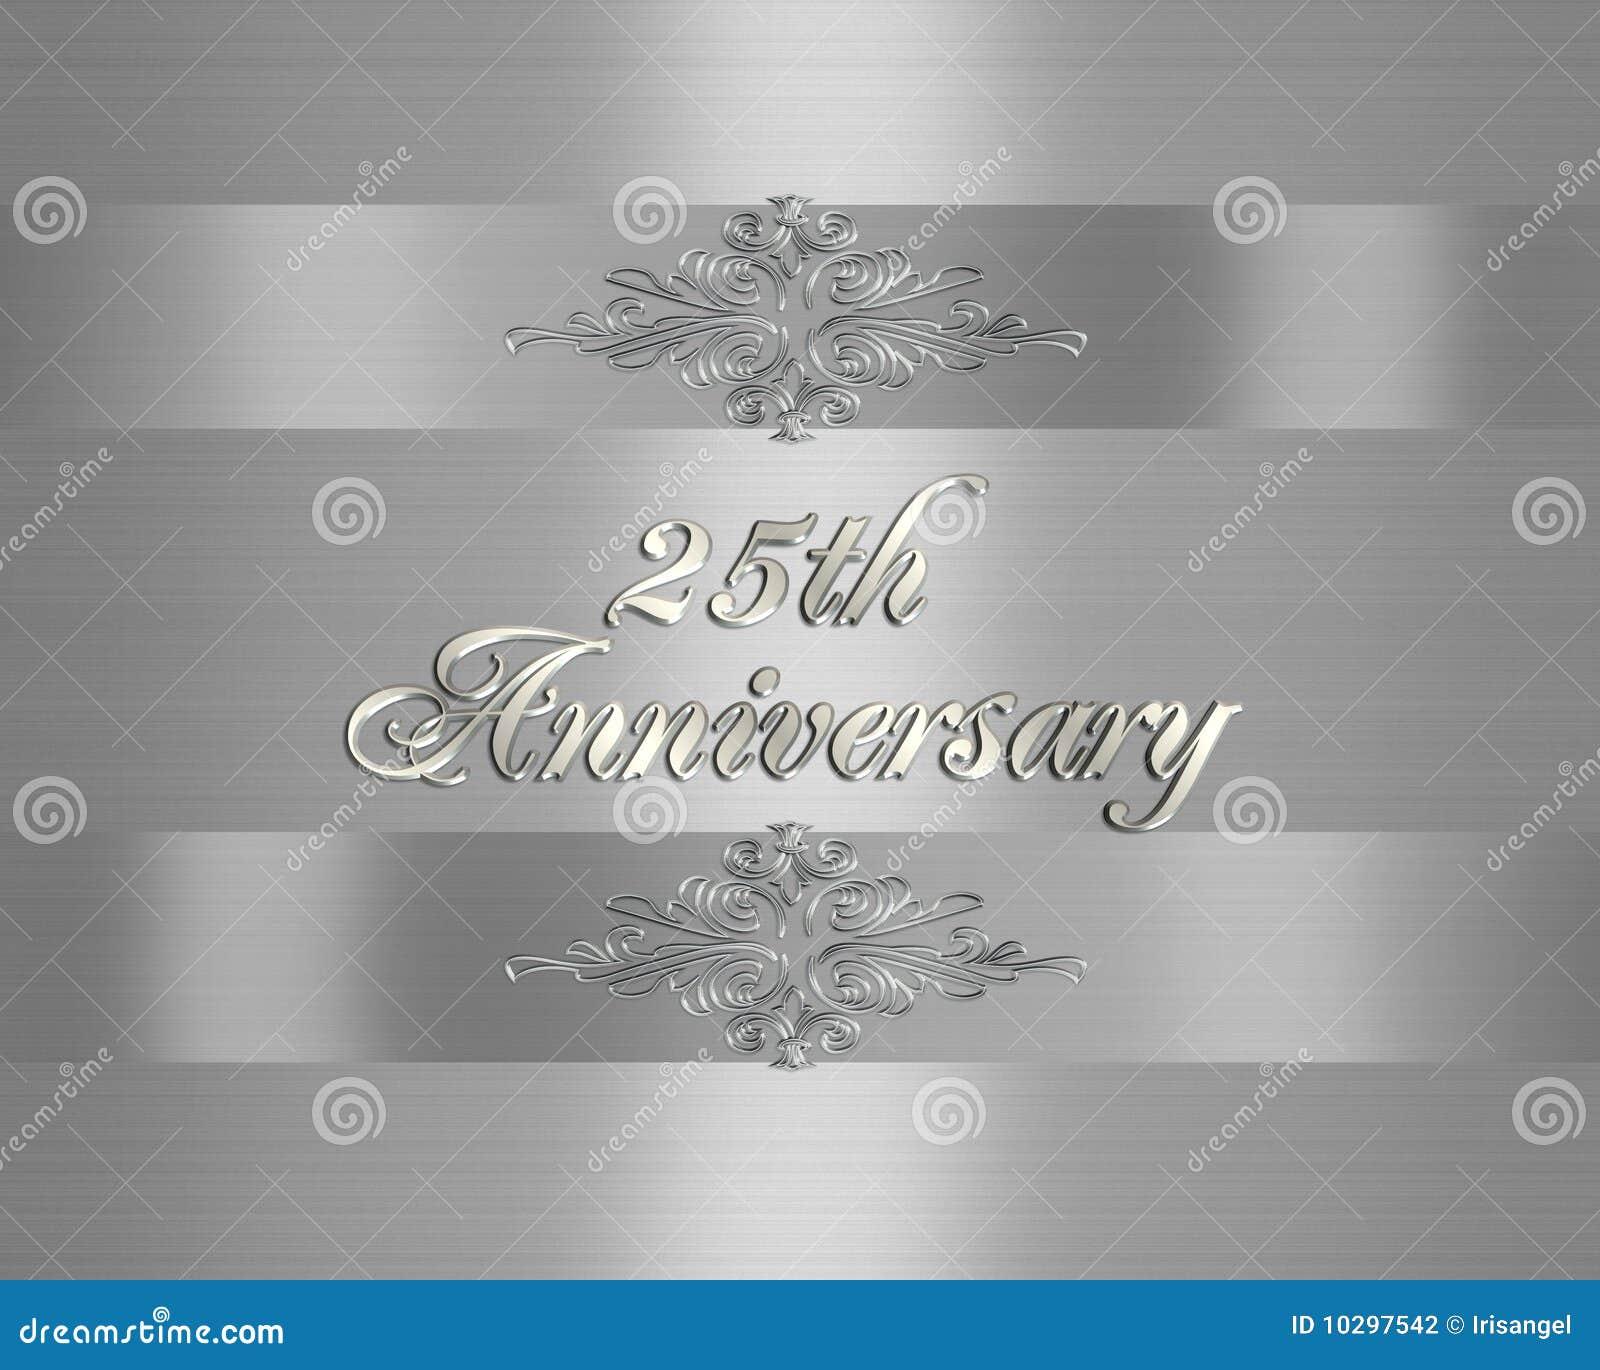 25th Wedding Anniversary Invitation Stock Illustration - Illustration of  marriage, celebration: 10297542